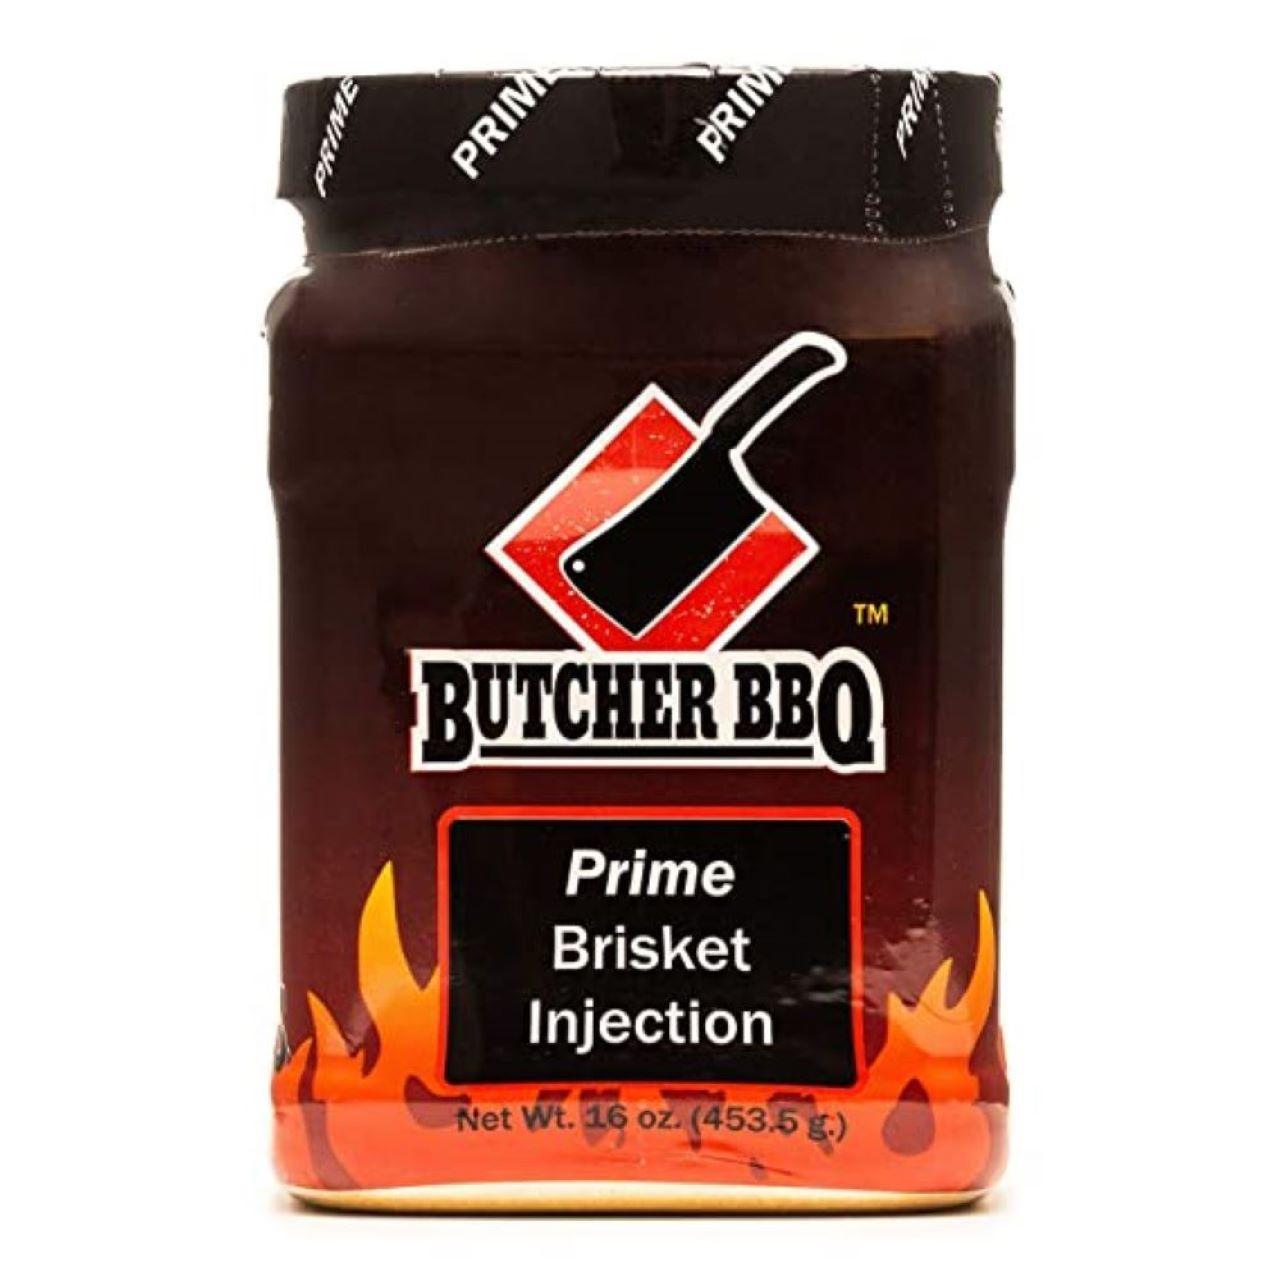 Butcher BBQ 16oz Prime Brisket Powder Injection Marinade